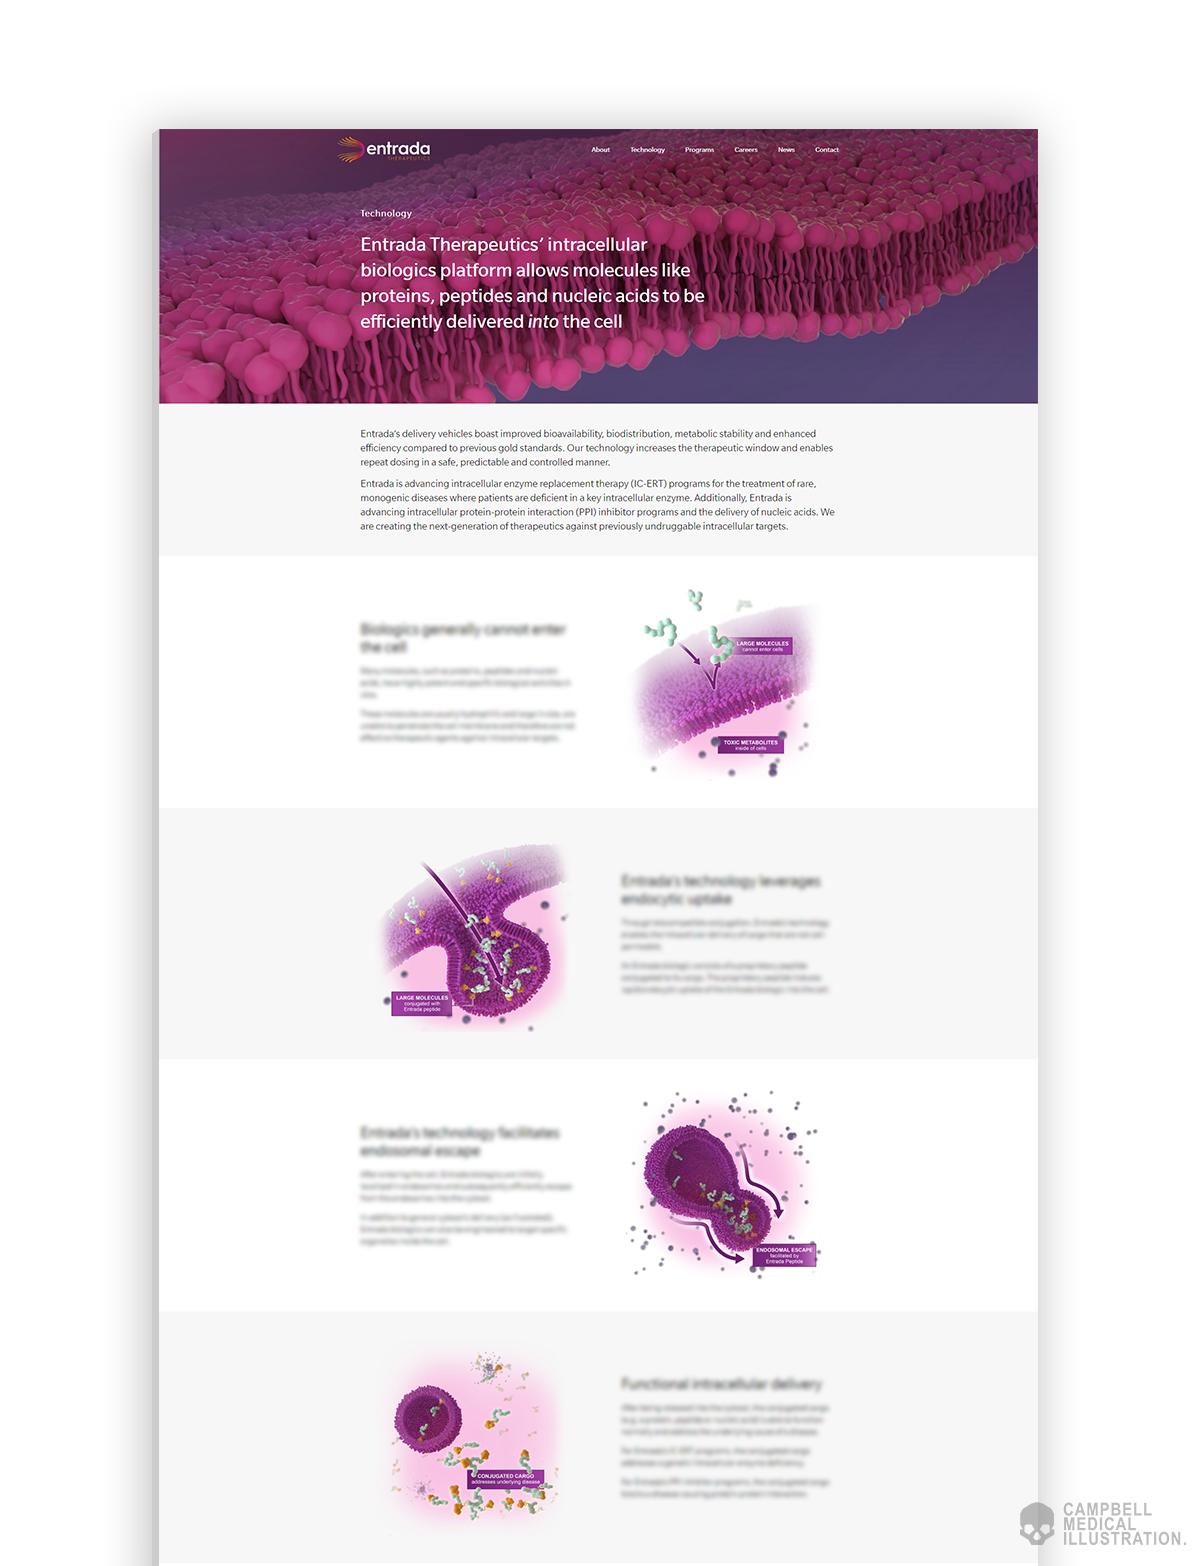 Entrada-Technology-page-design-showcase-medical-illustration.png